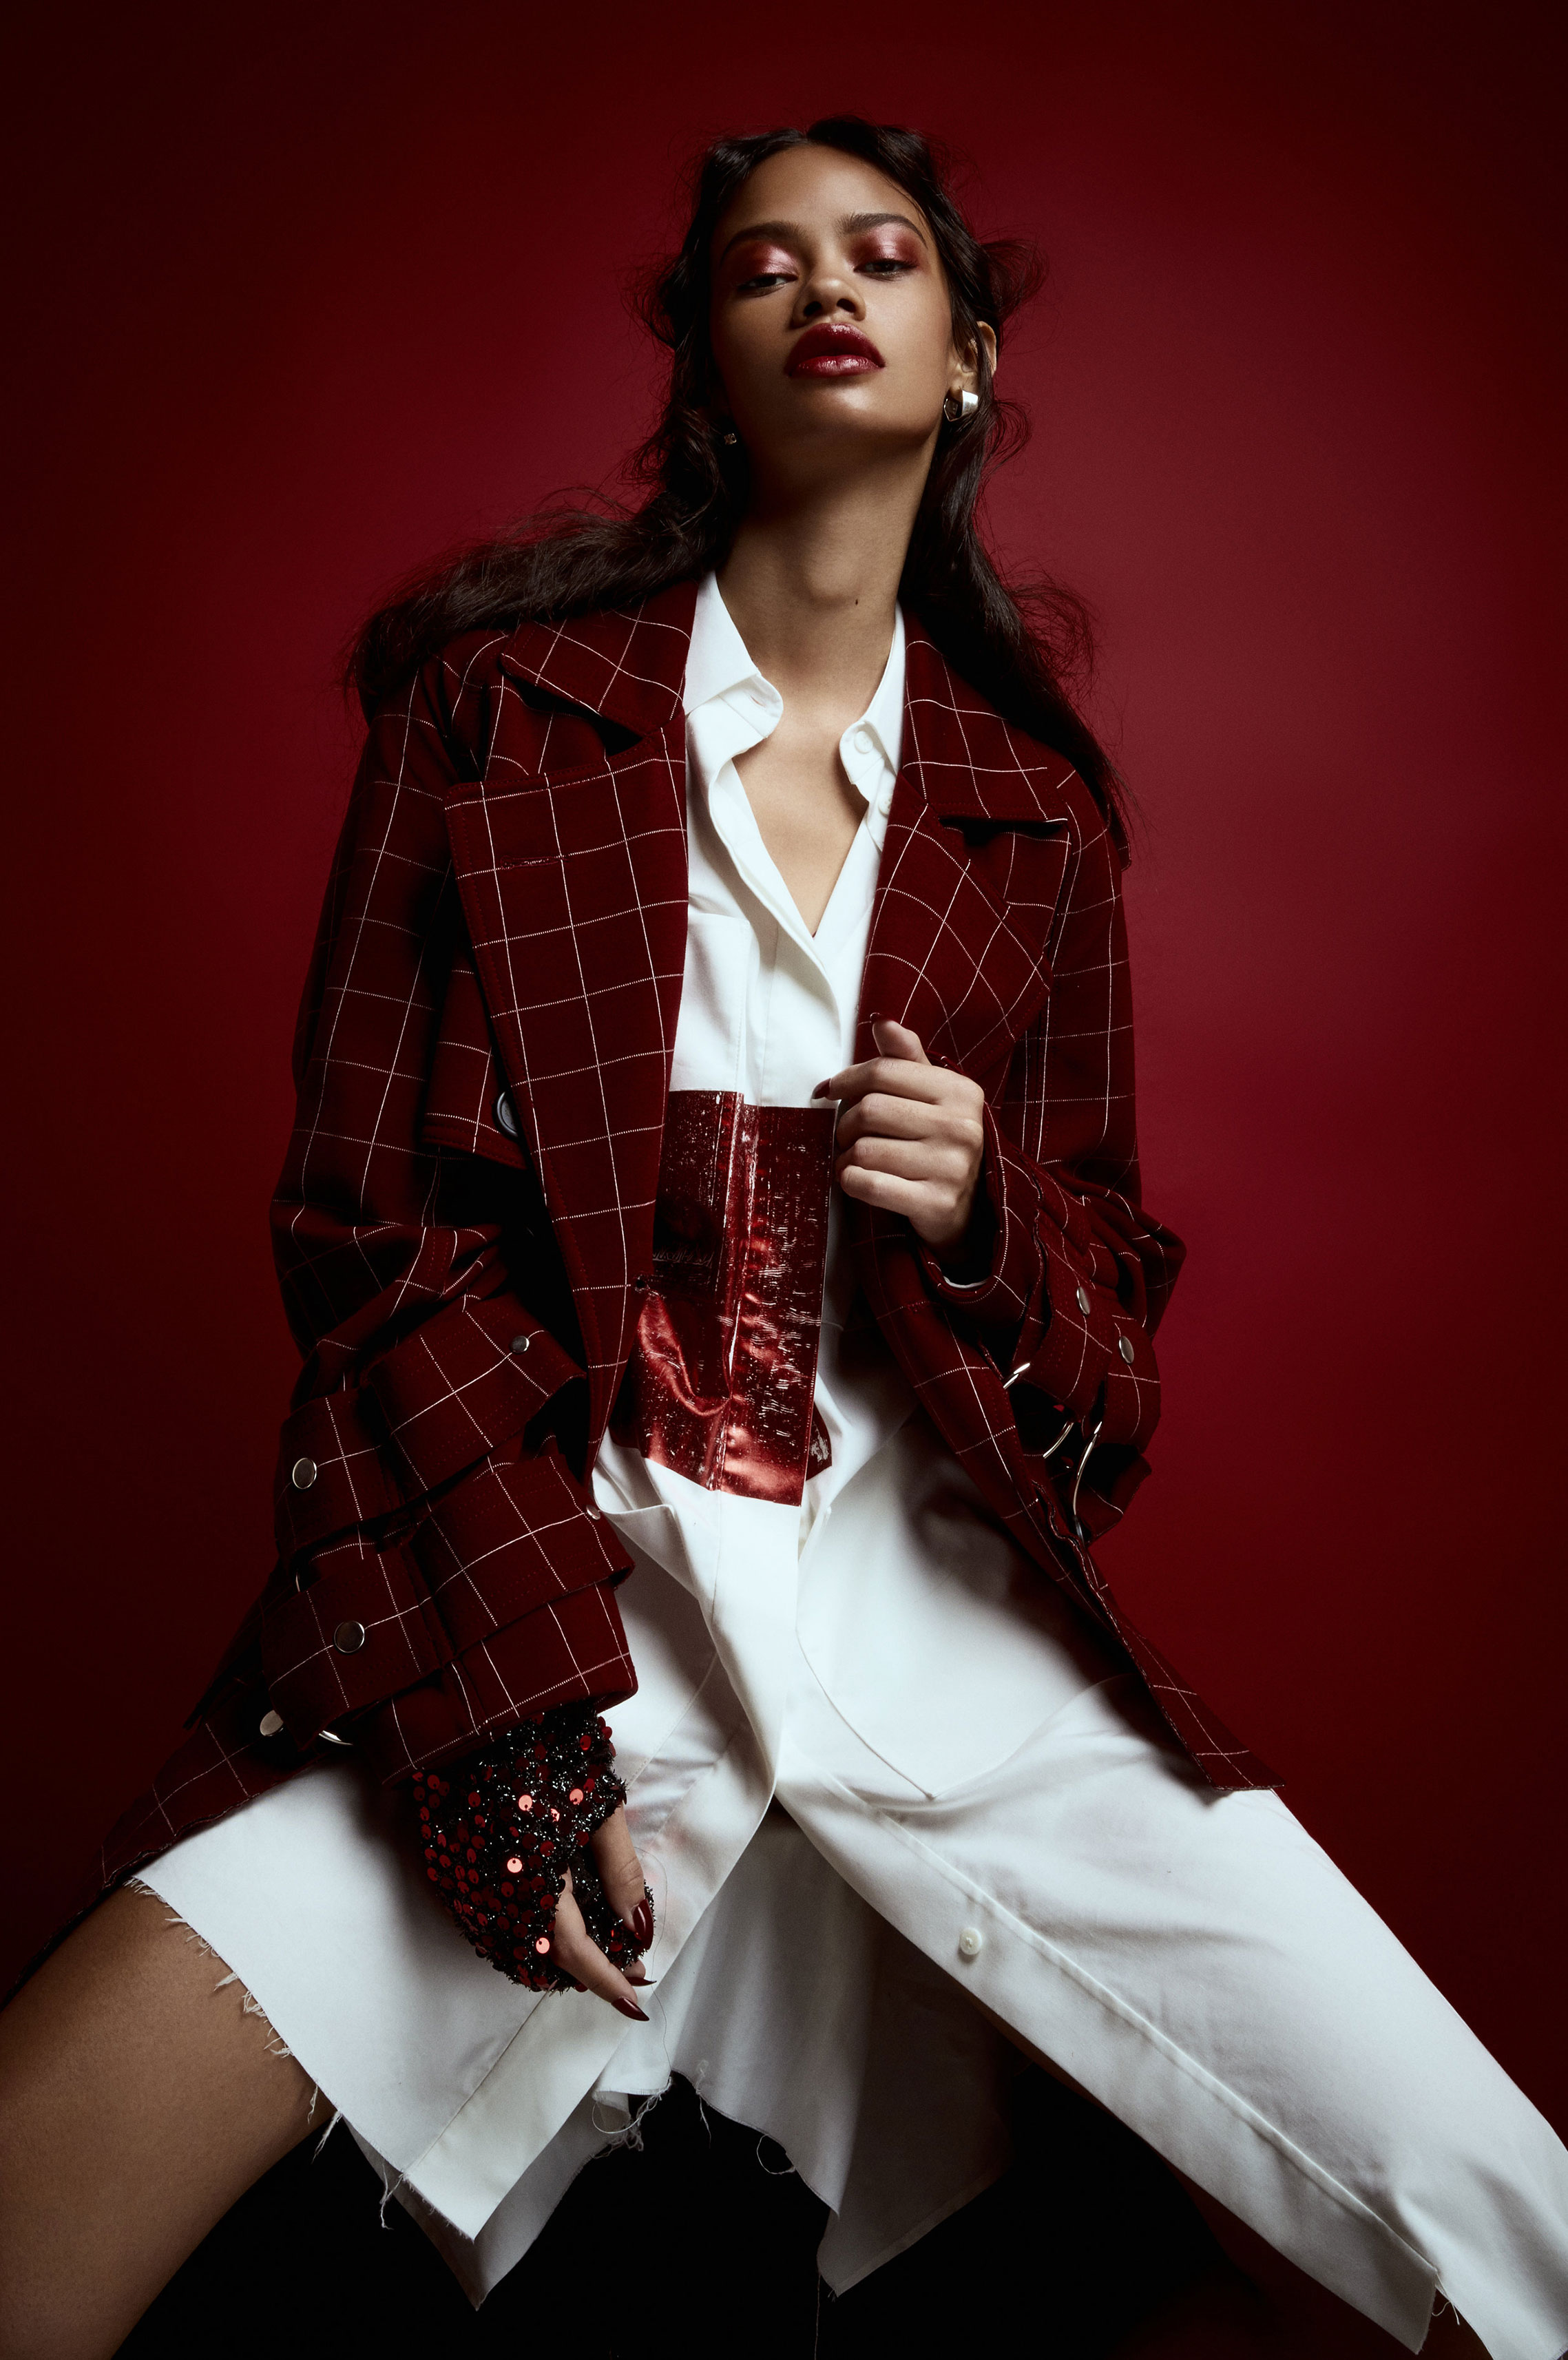 Таис Мартинс - женщина в красном / фото 03